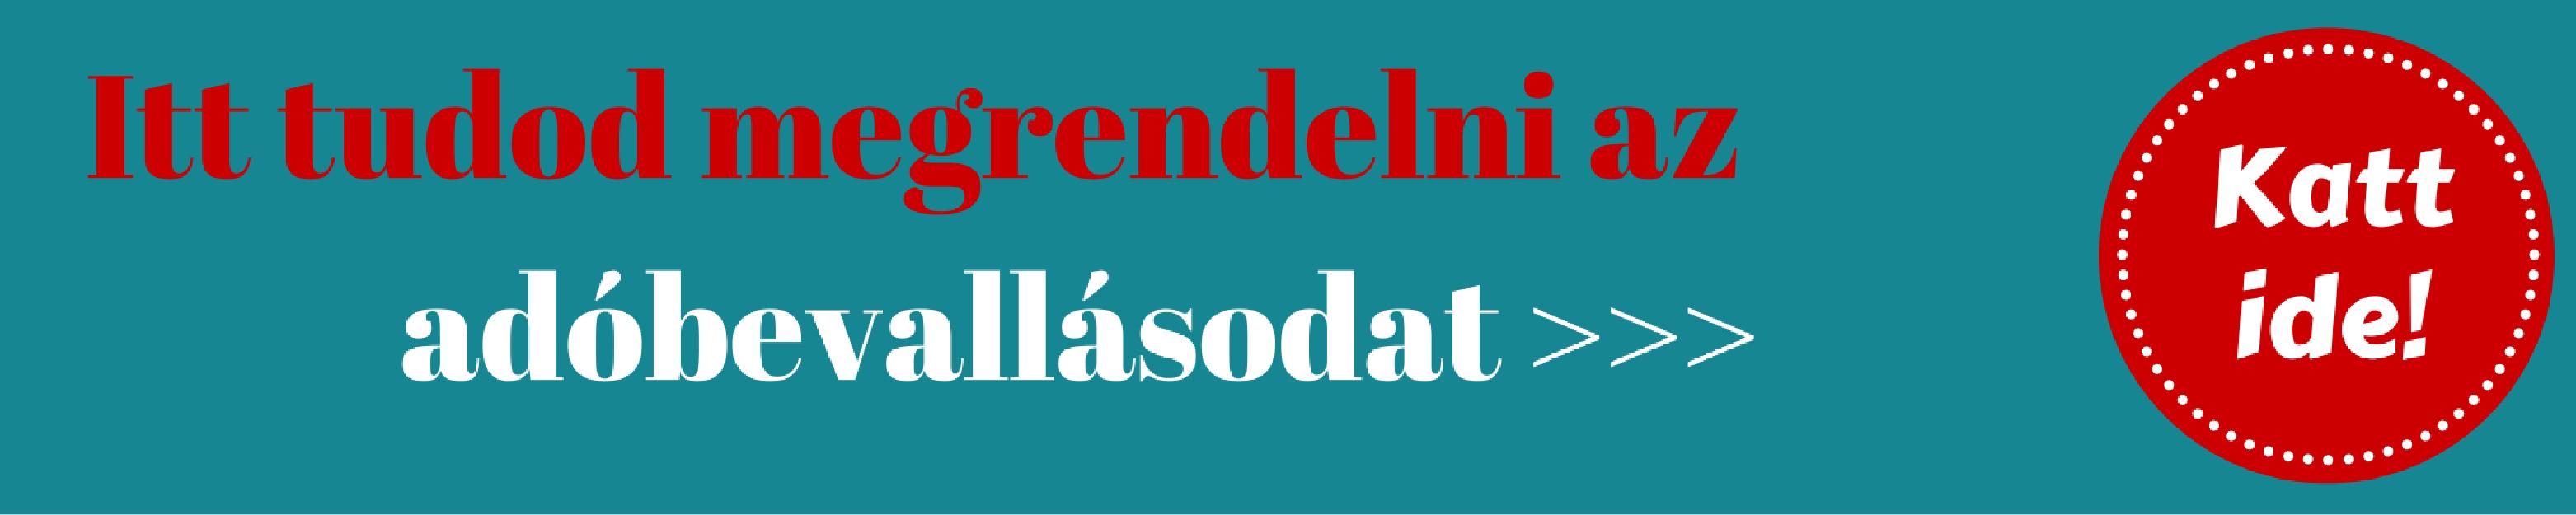 http://tudatosadozo.hu/szolgaltatasok/online-adobevallas/